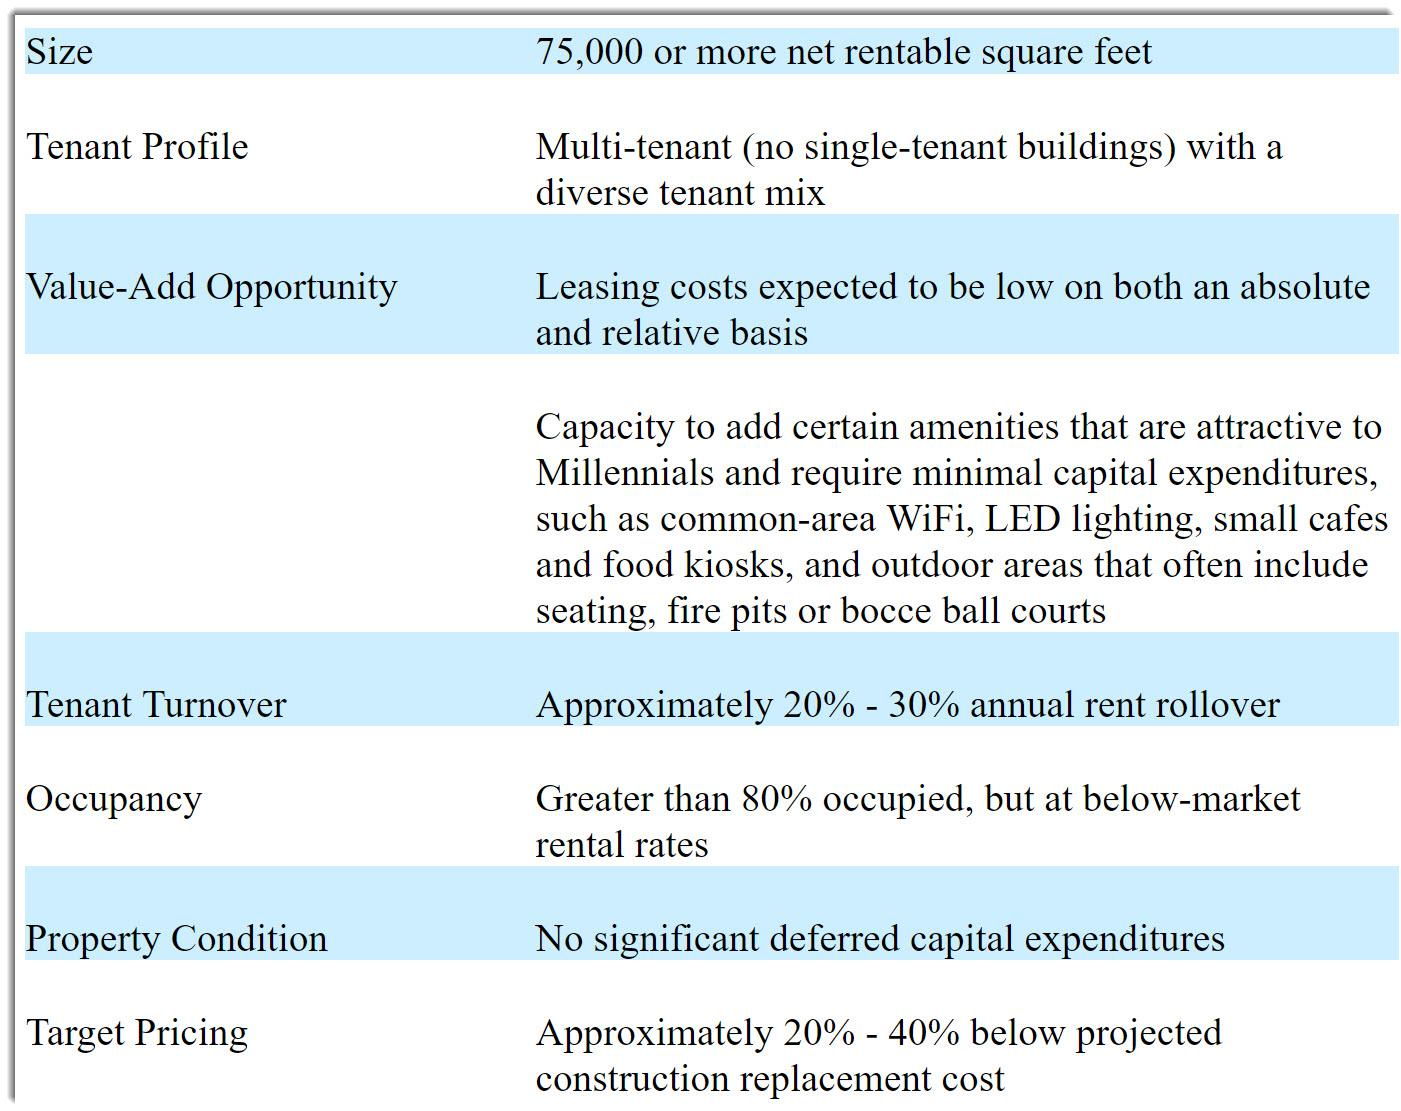 Priam Properties Files For U.S. IPO